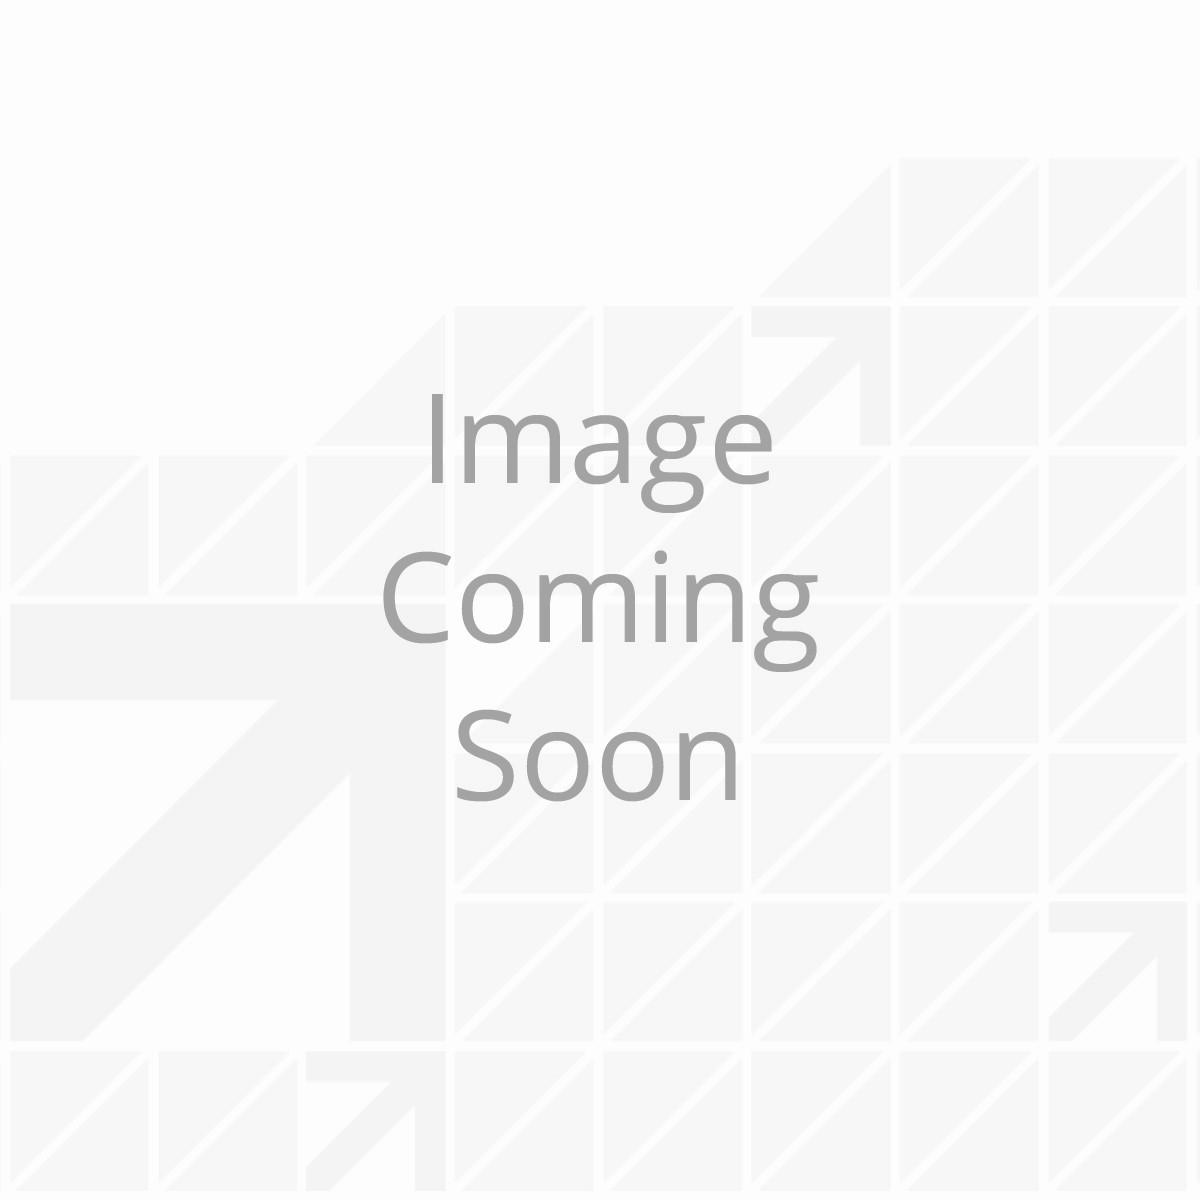 359077_-_pg_leveling_control_box_kit_-_001